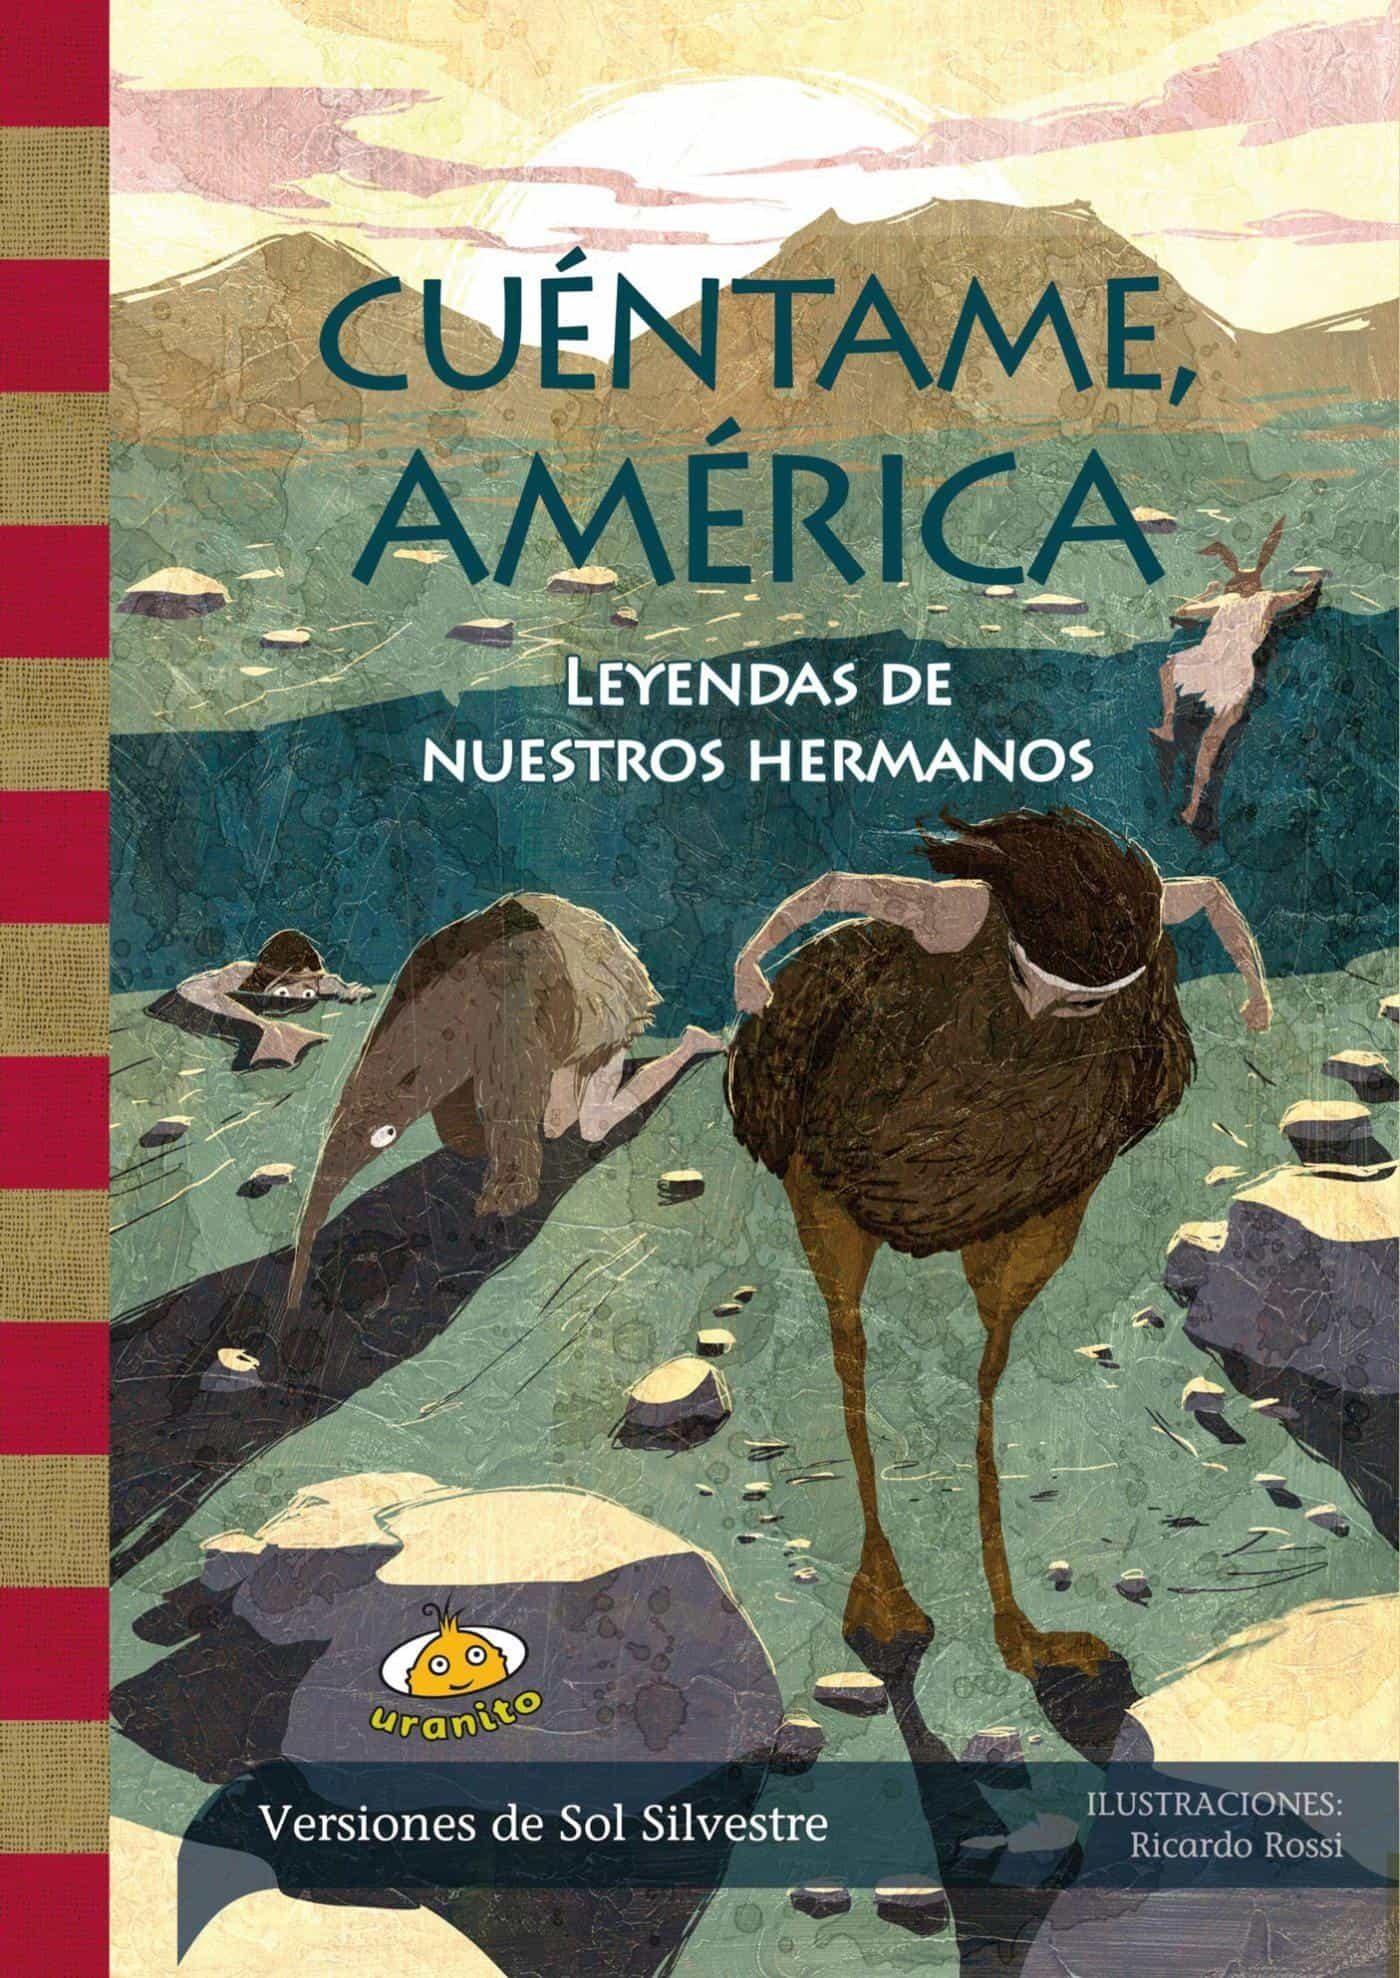 CUÉNTAME, AMÉRICA EBOOK | SOL SILVESTRE | Descargar libro PDF o EPUB  9789877030617